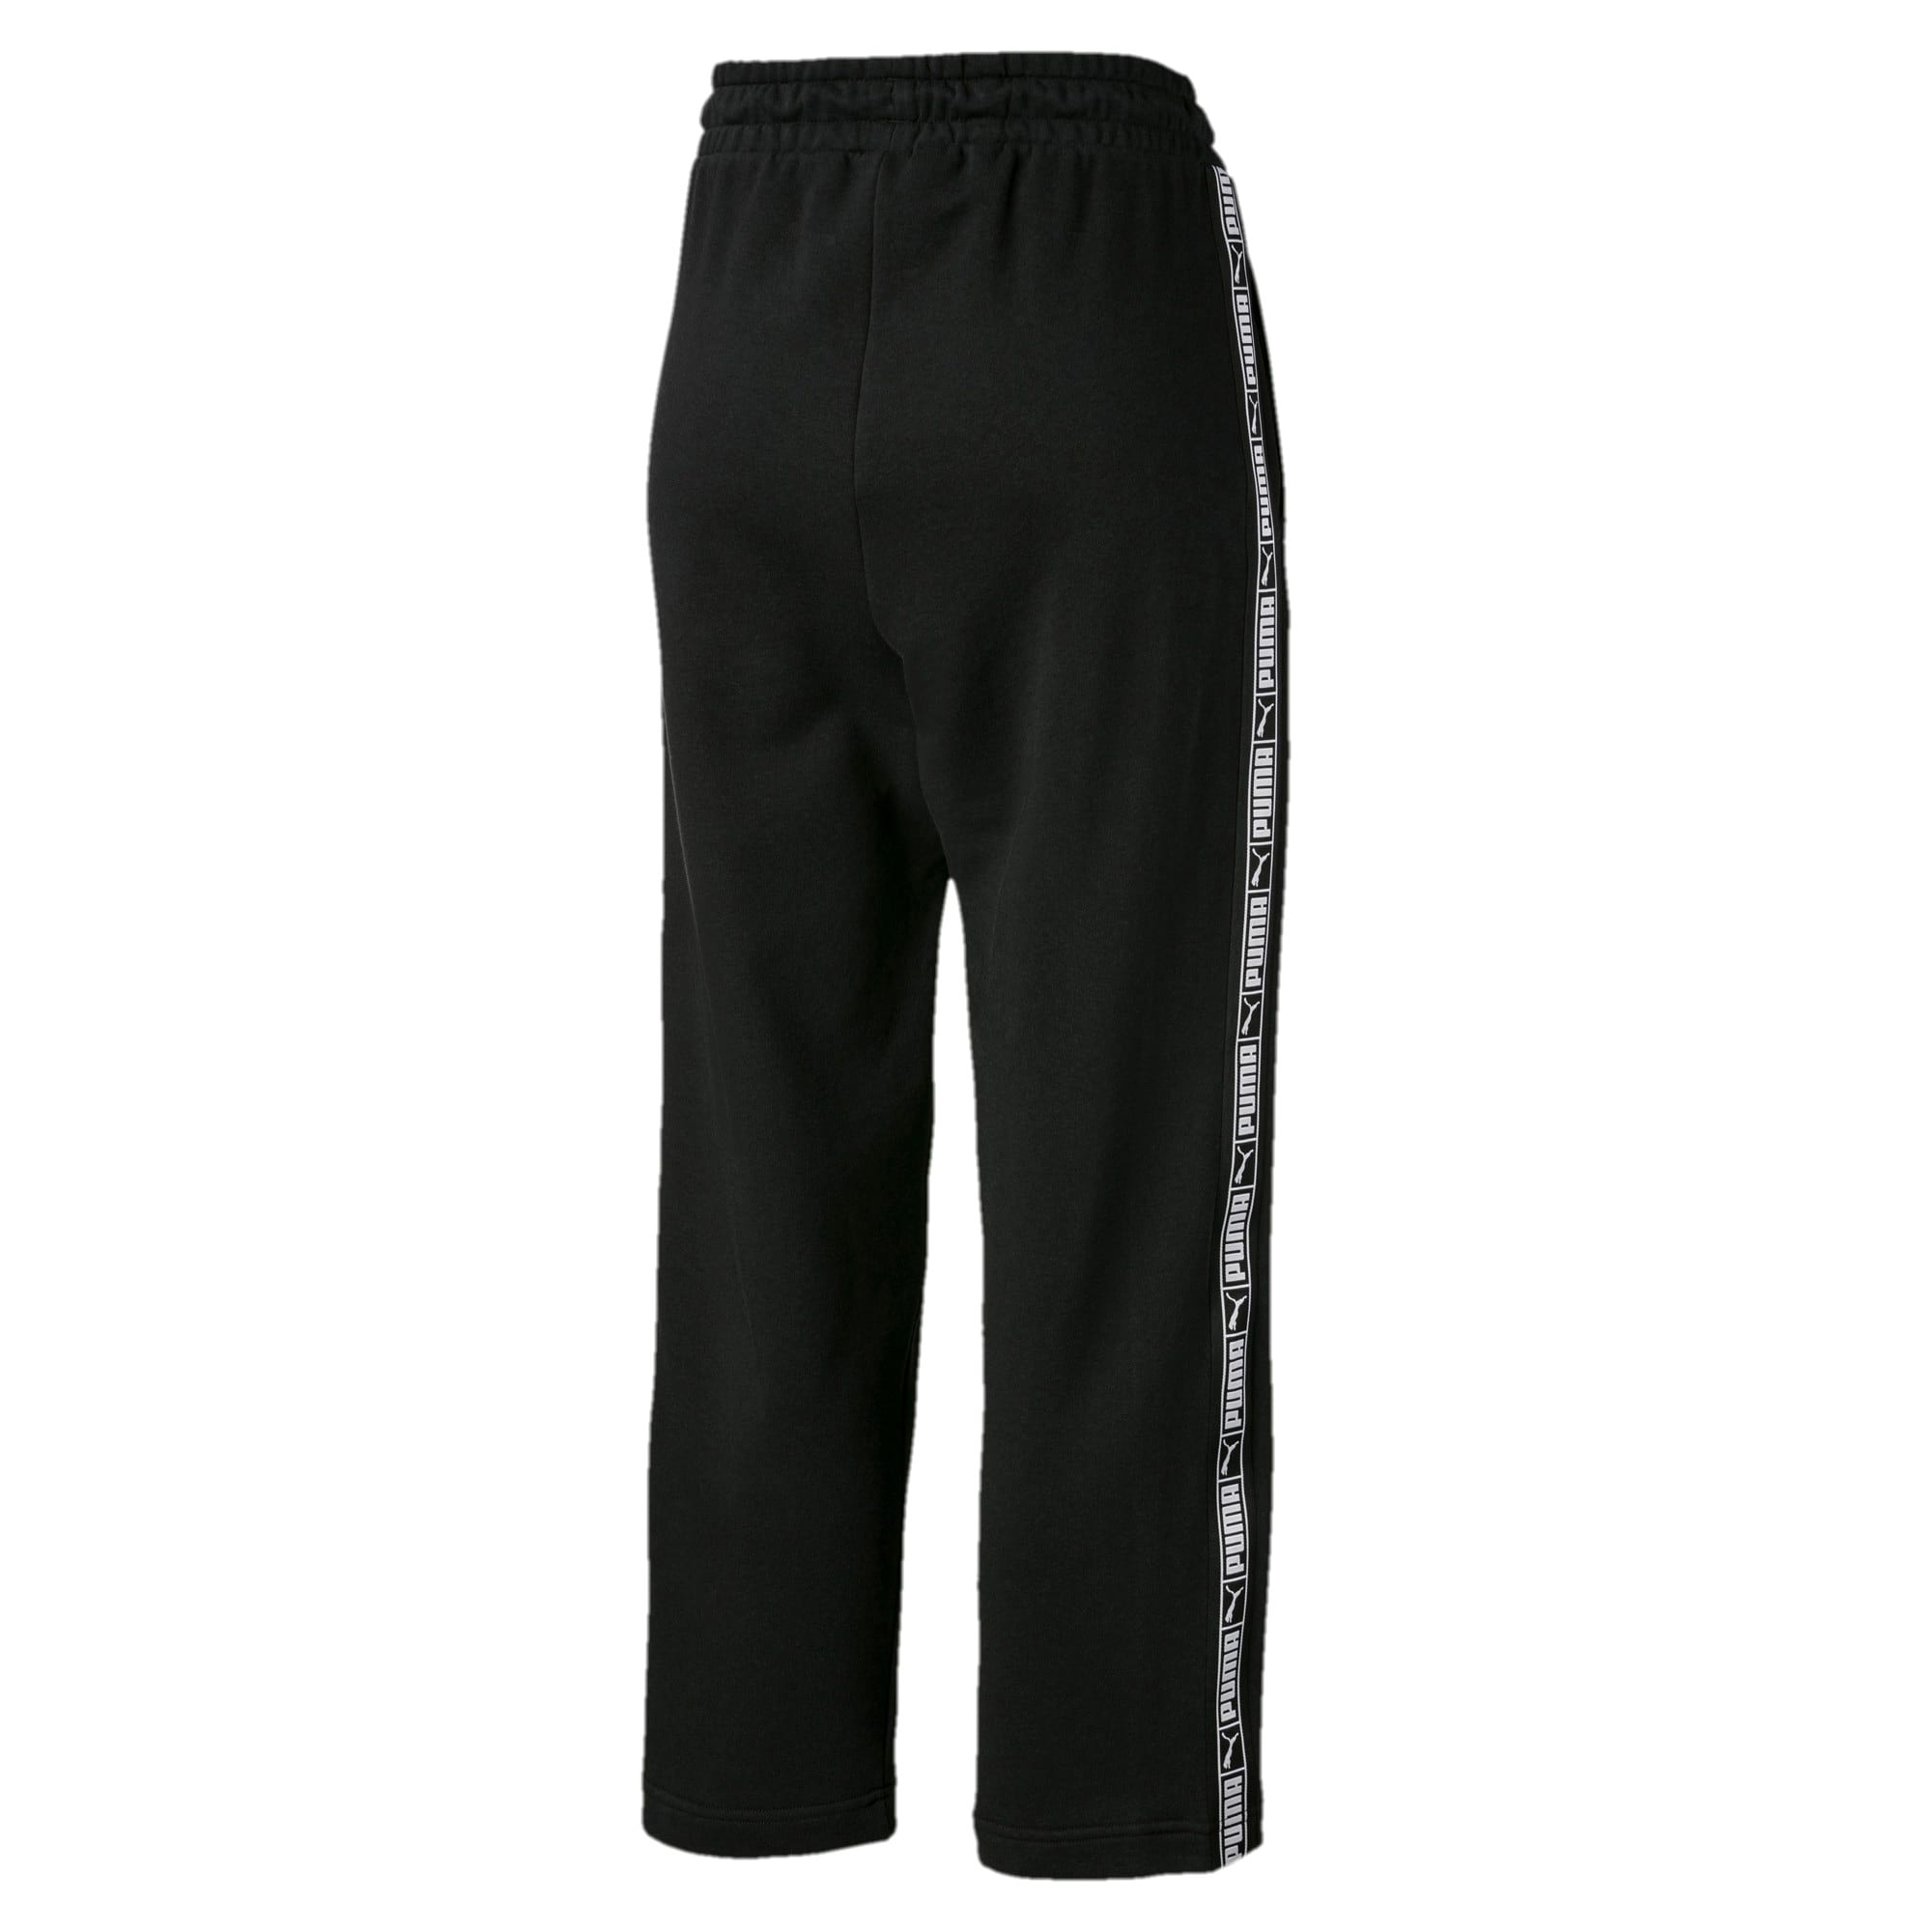 Thumbnail 5 of Classics Women's Track Pants, Puma Black, medium